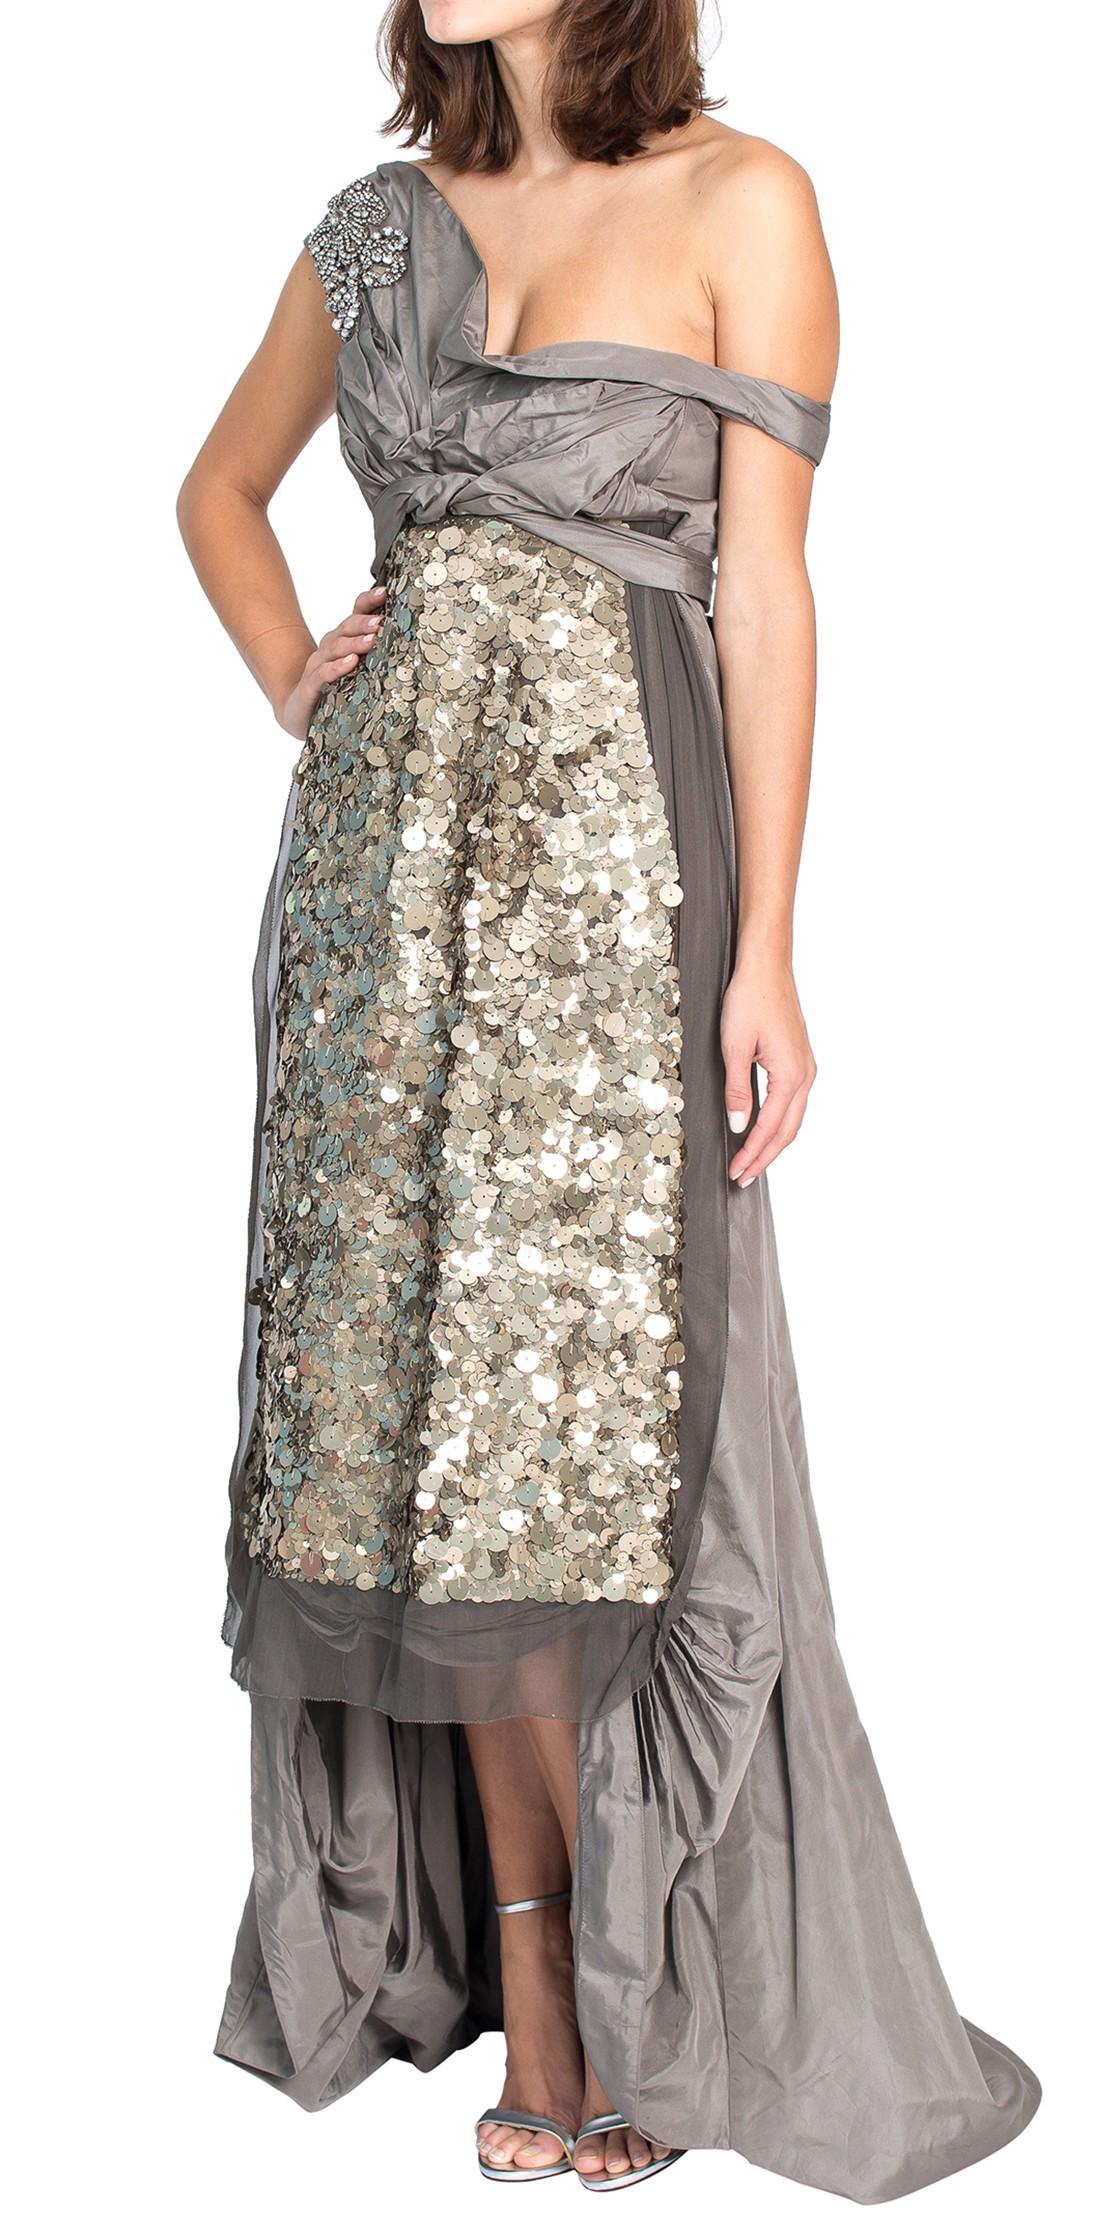 Off the Shoulder Sequined Gown | Evening Dresses Rental | Dubai ...